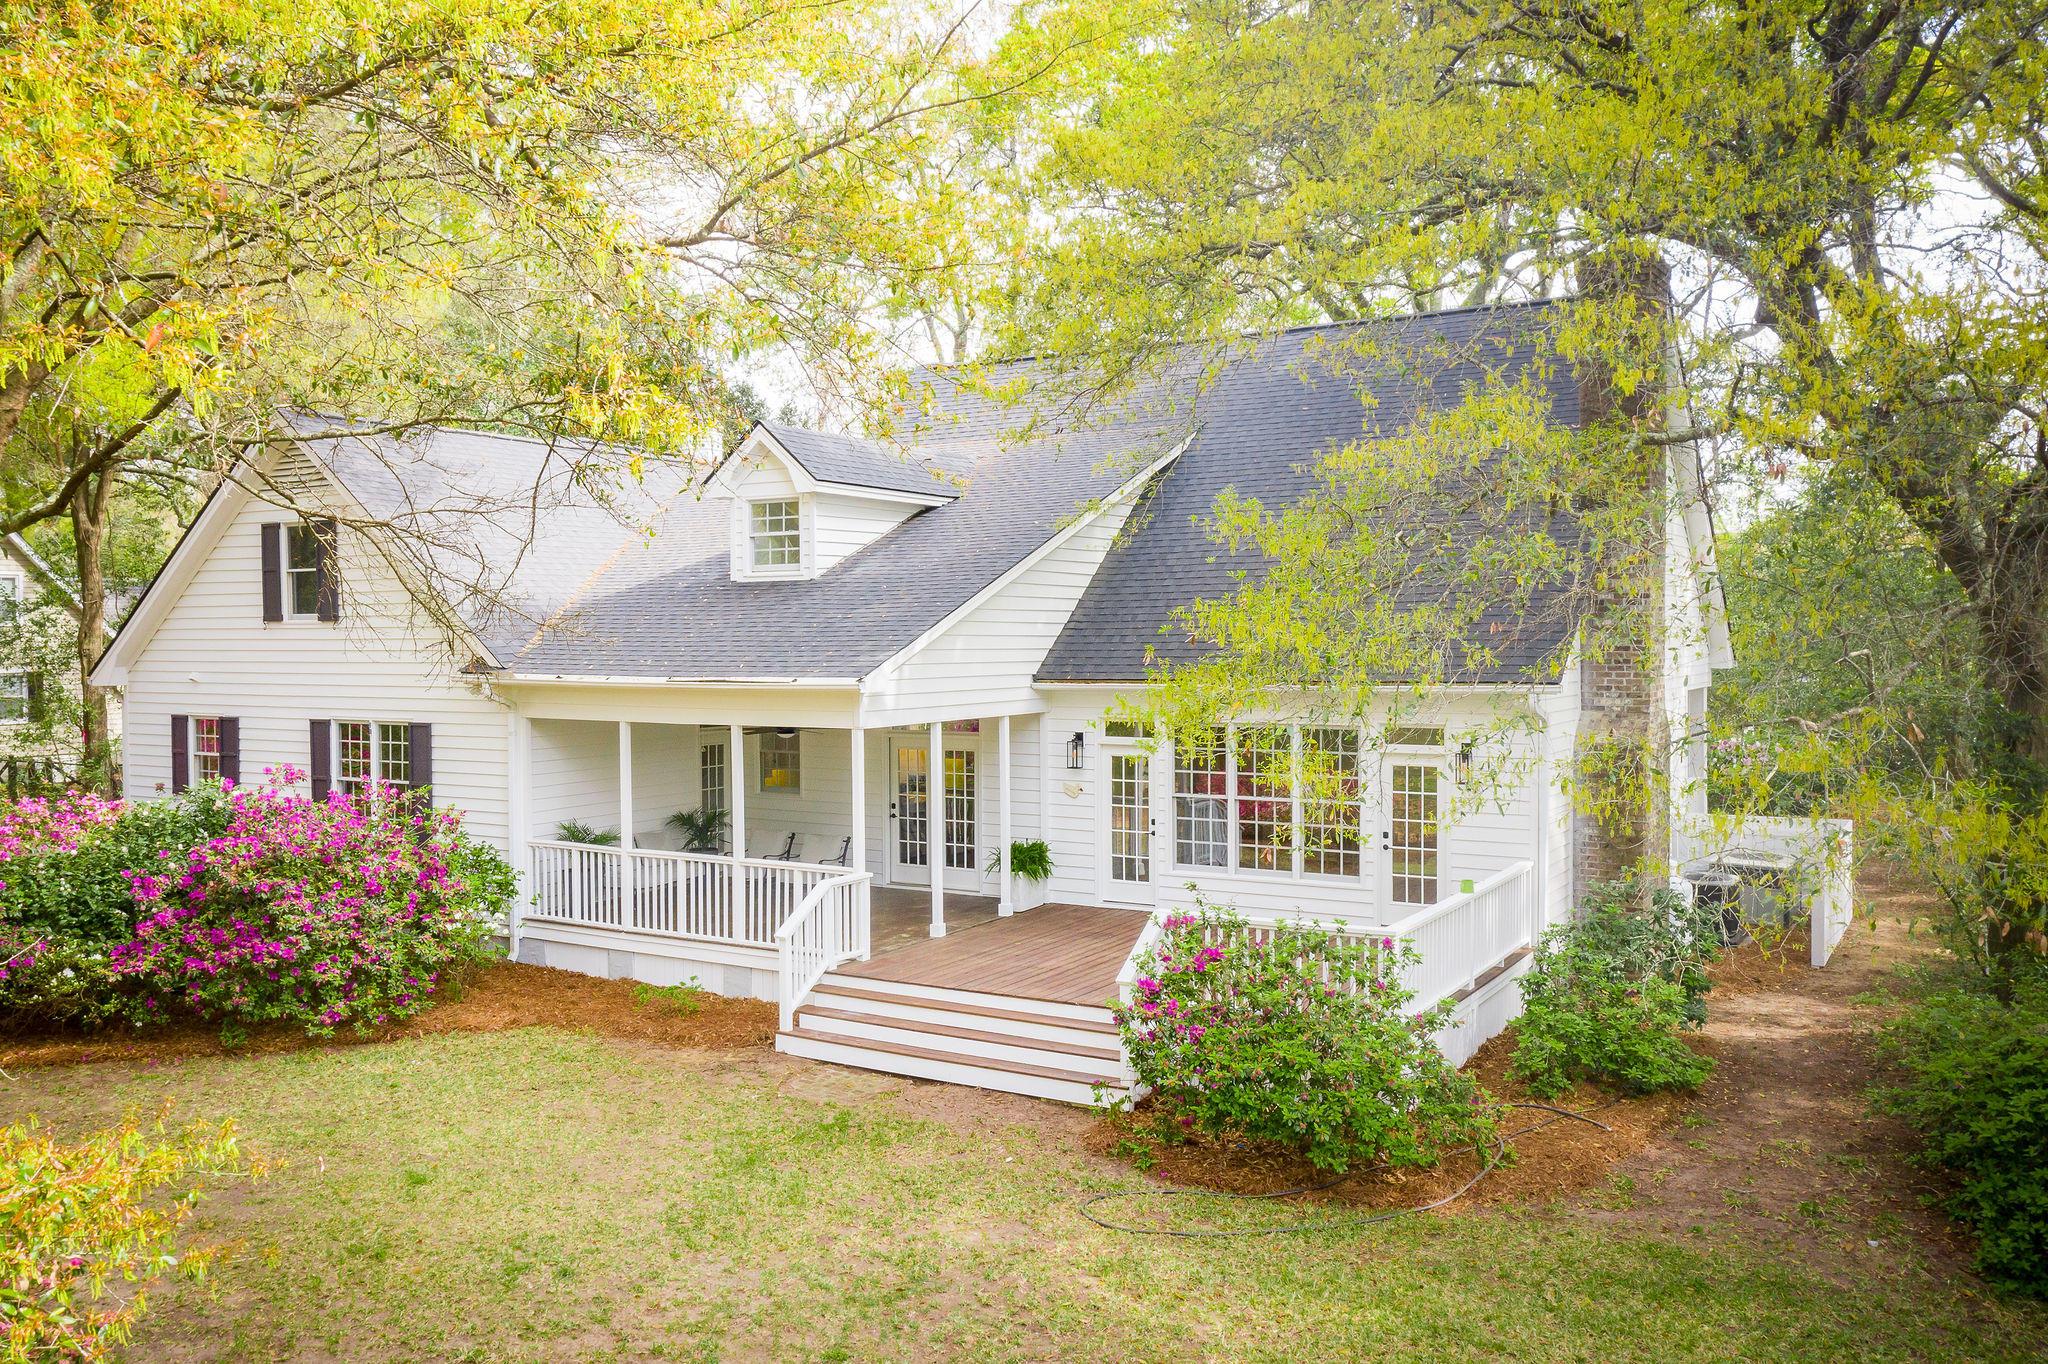 Old Mt Pleasant Homes For Sale - 1417 Edwards, Mount Pleasant, SC - 40